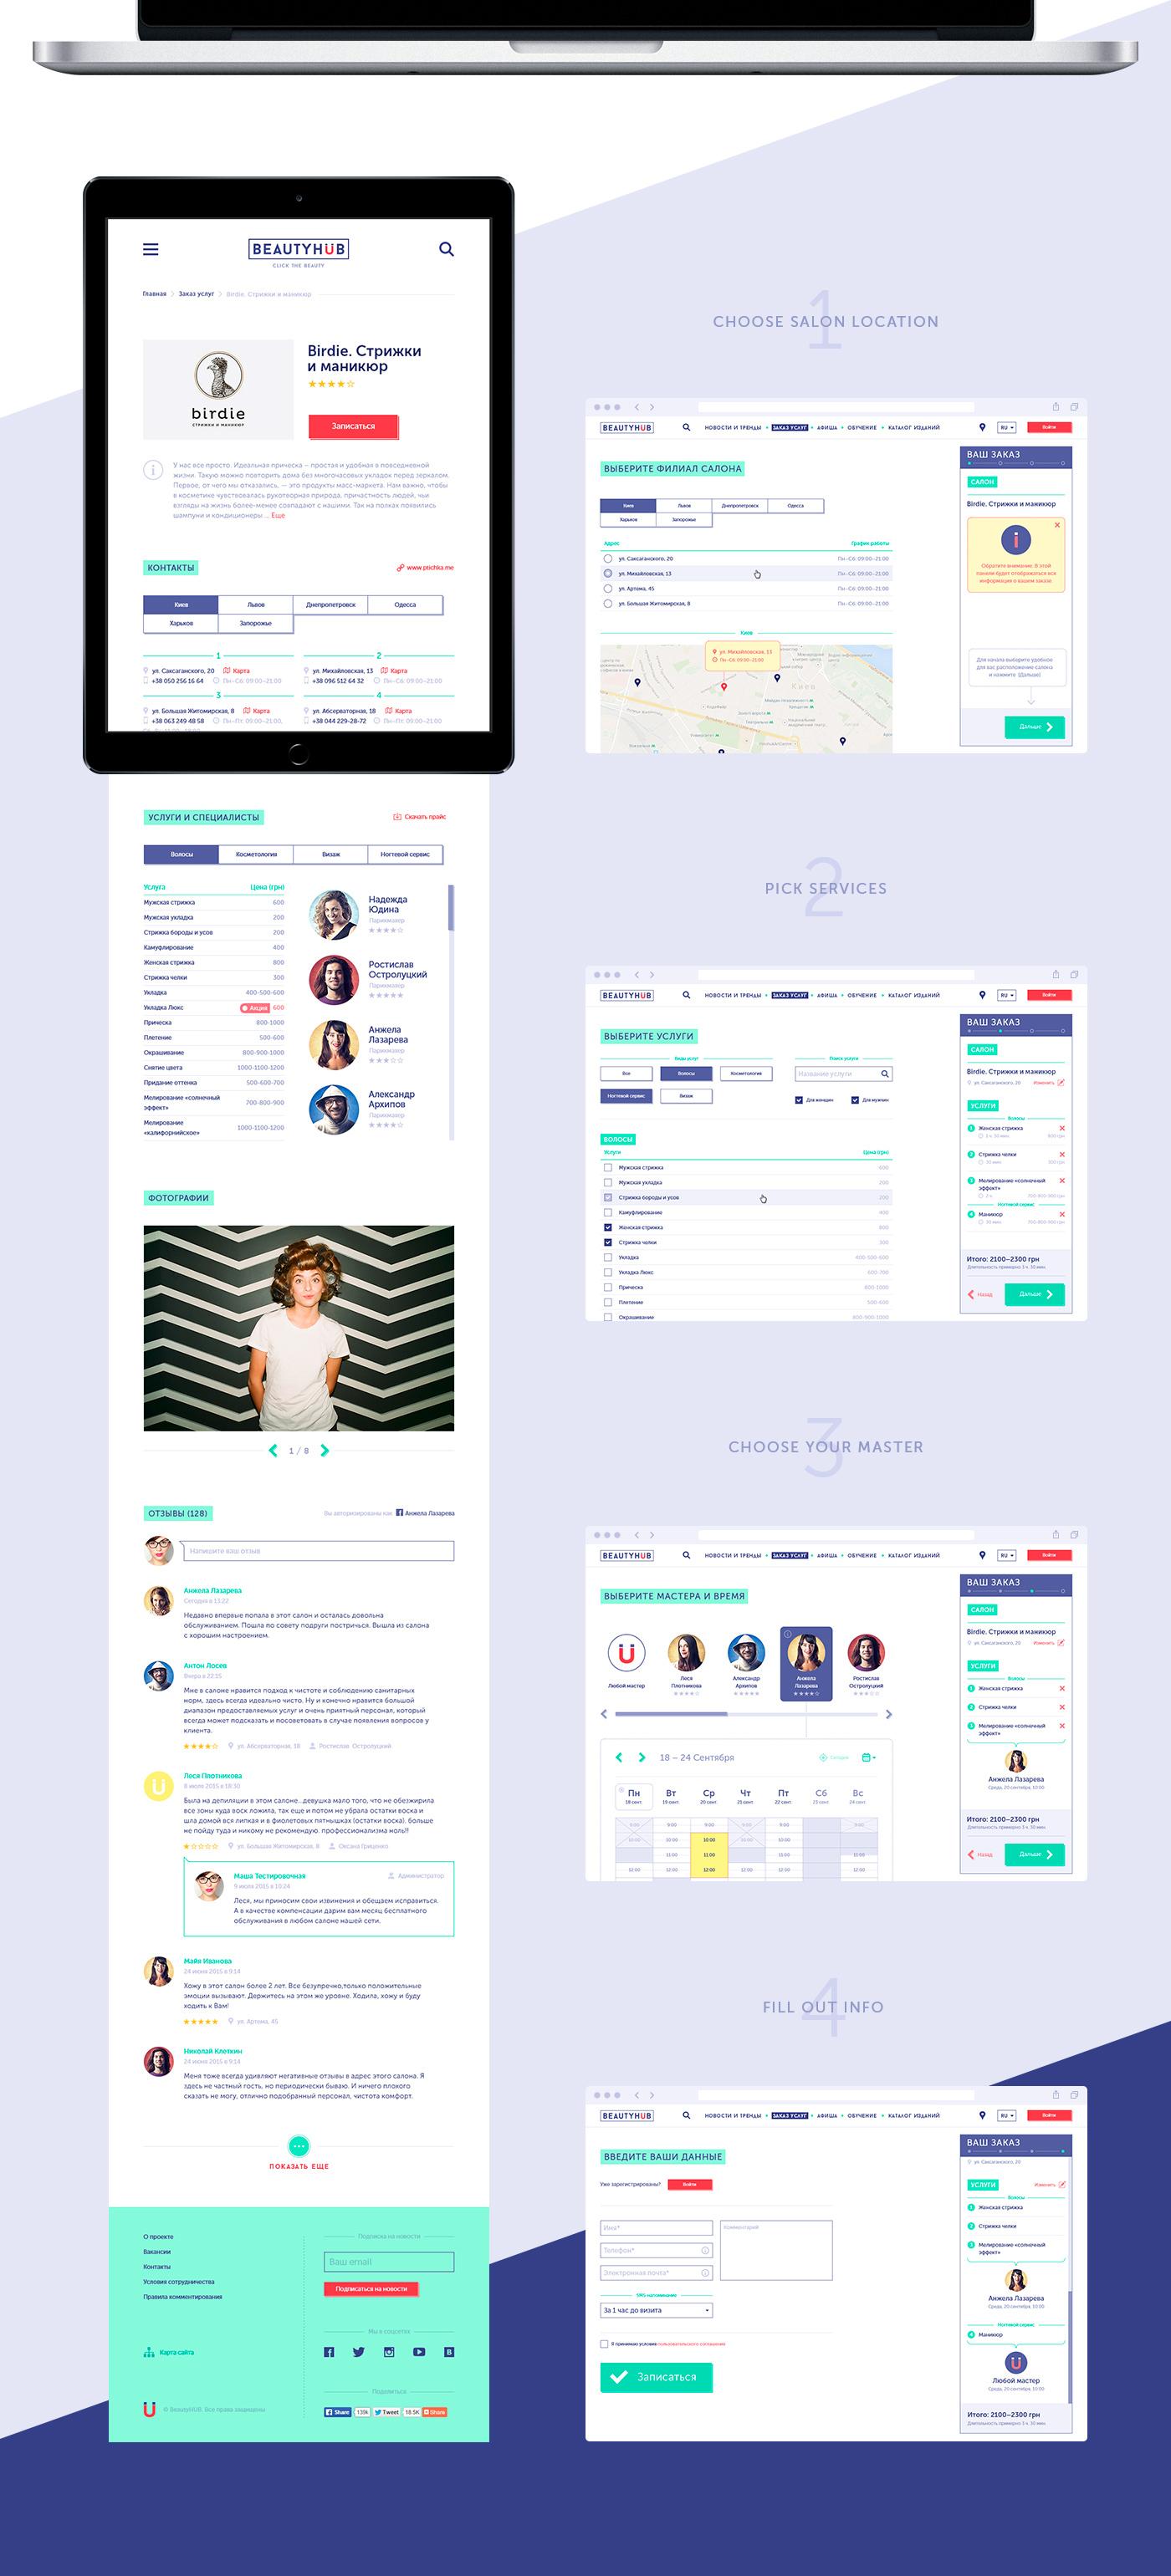 beauty beauty salon Booking service portal fashion site